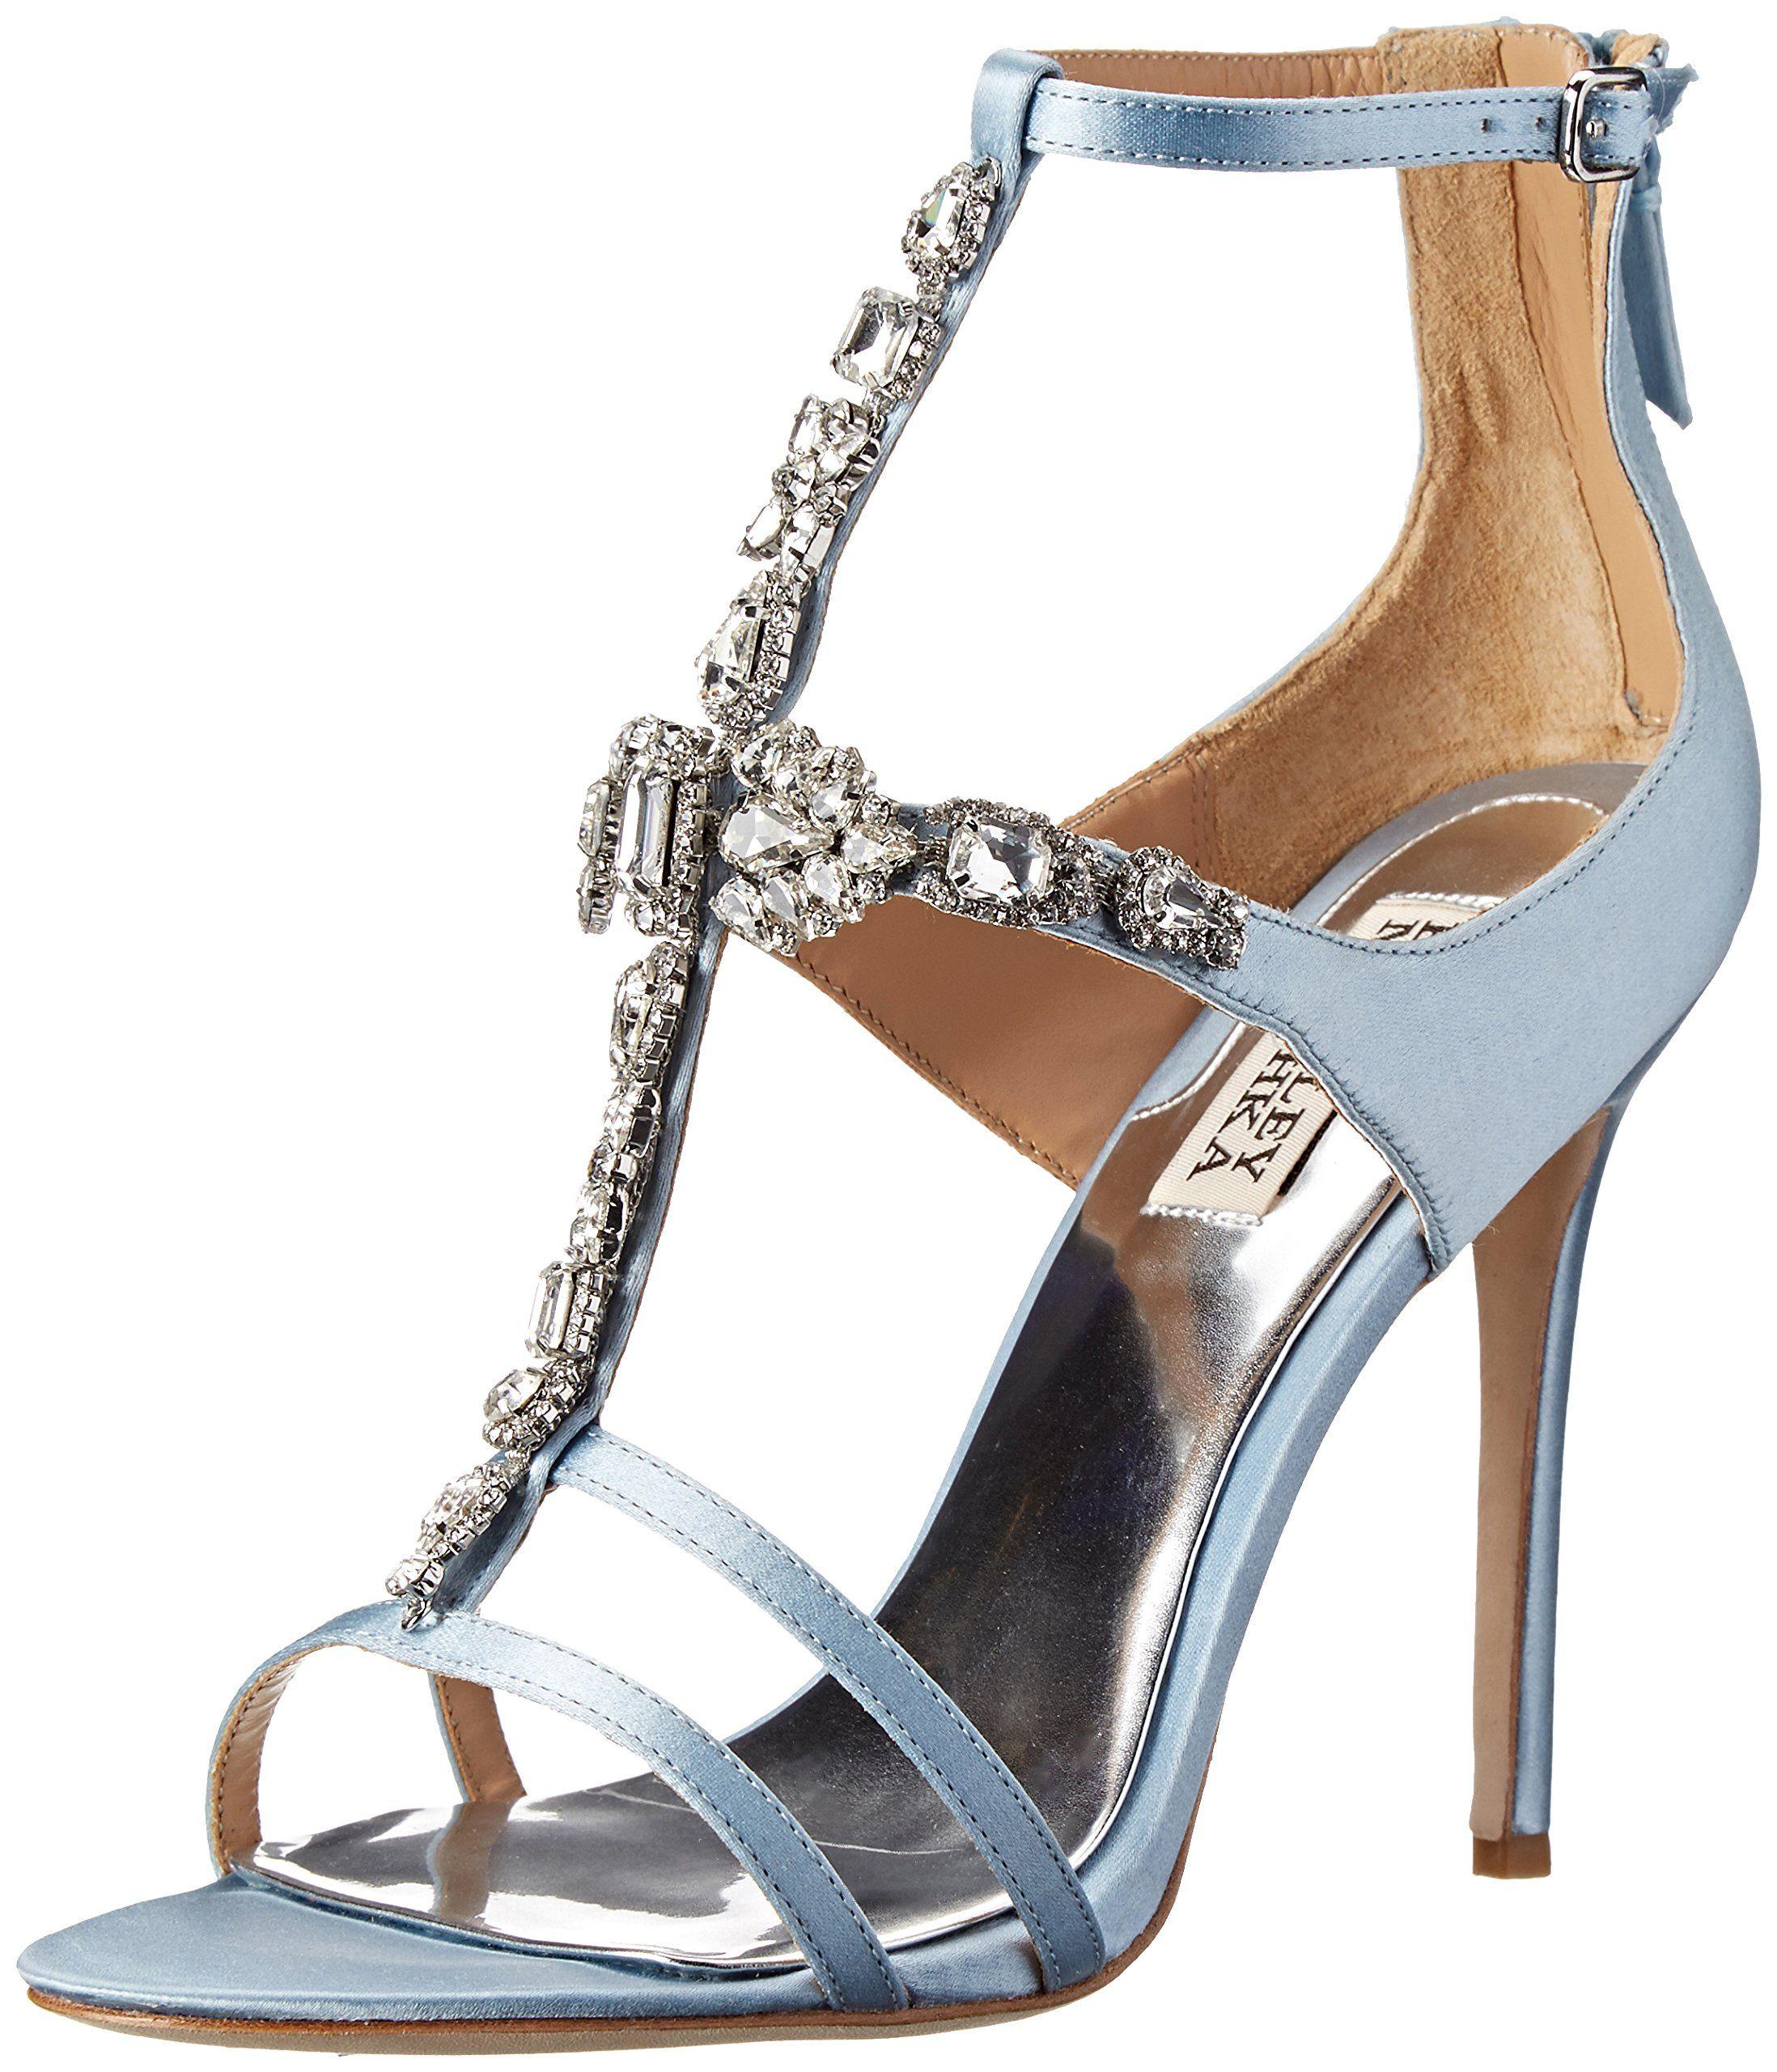 5ce342fc4723a Amazon.com: Badgley Mischka Women's Giovana Dress Sandal: Shoes ...